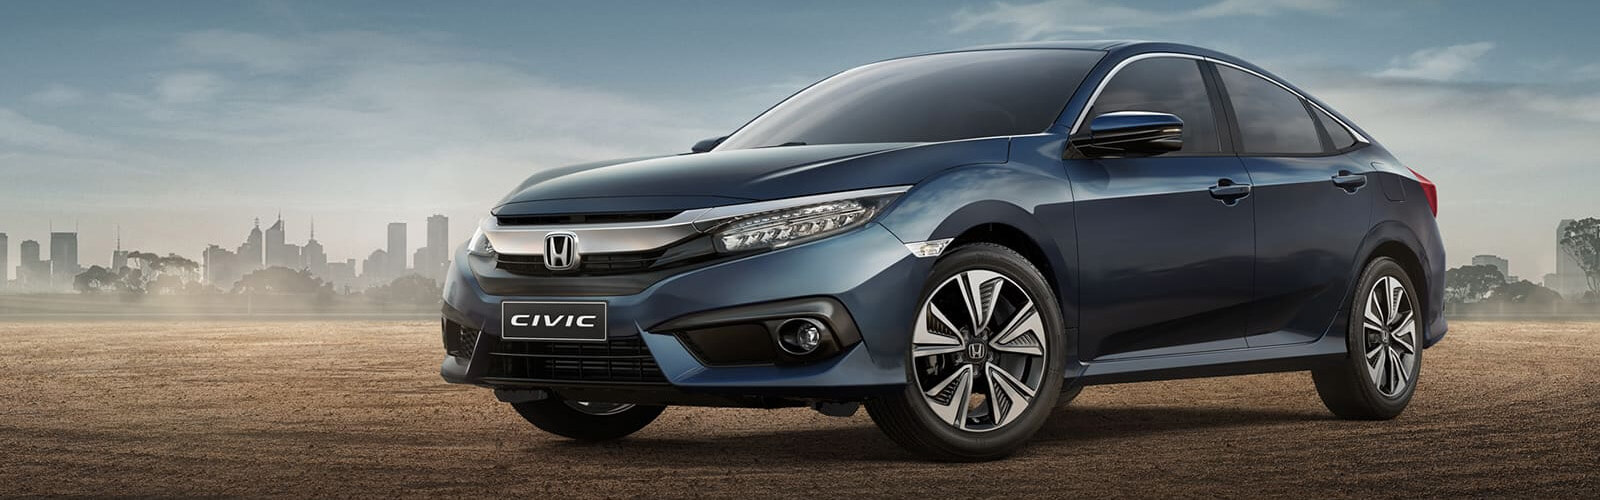 New Honda Civic Sedan For Sale In Sunshine Coast Cricks Honda